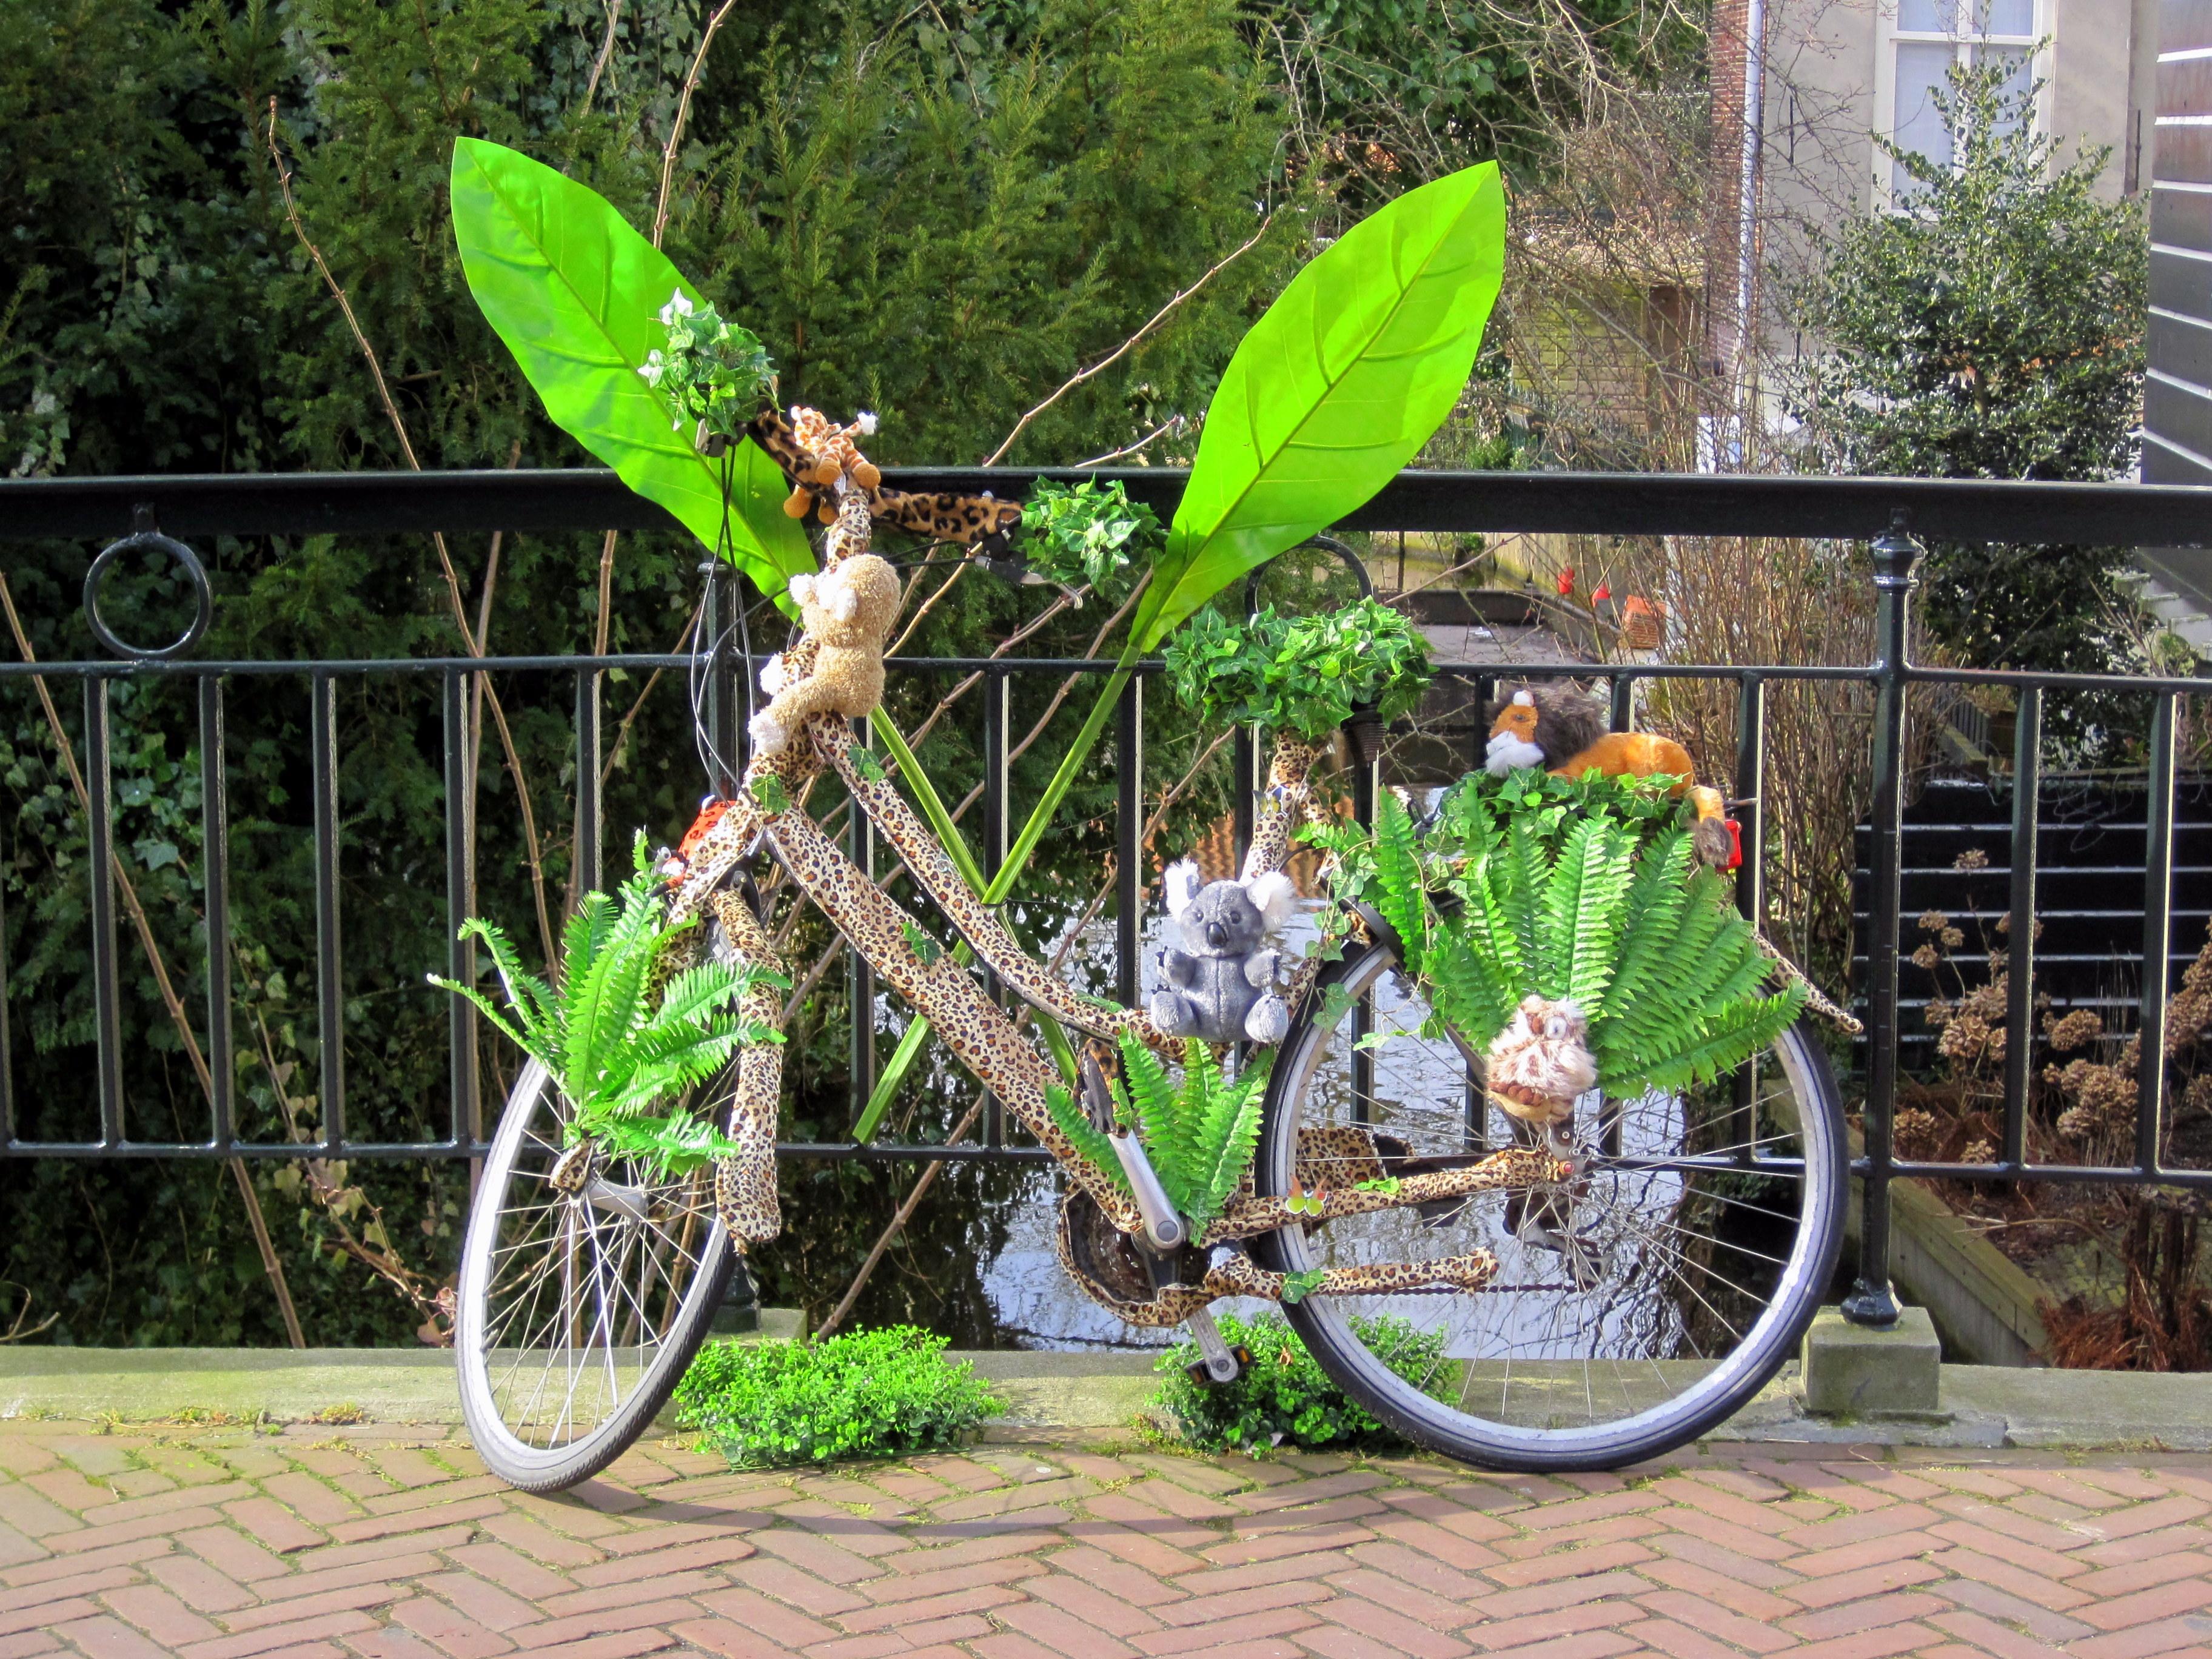 IMG_8773 Edam. Voledam. Barrio Jordaam (Amsterdam) Viajes